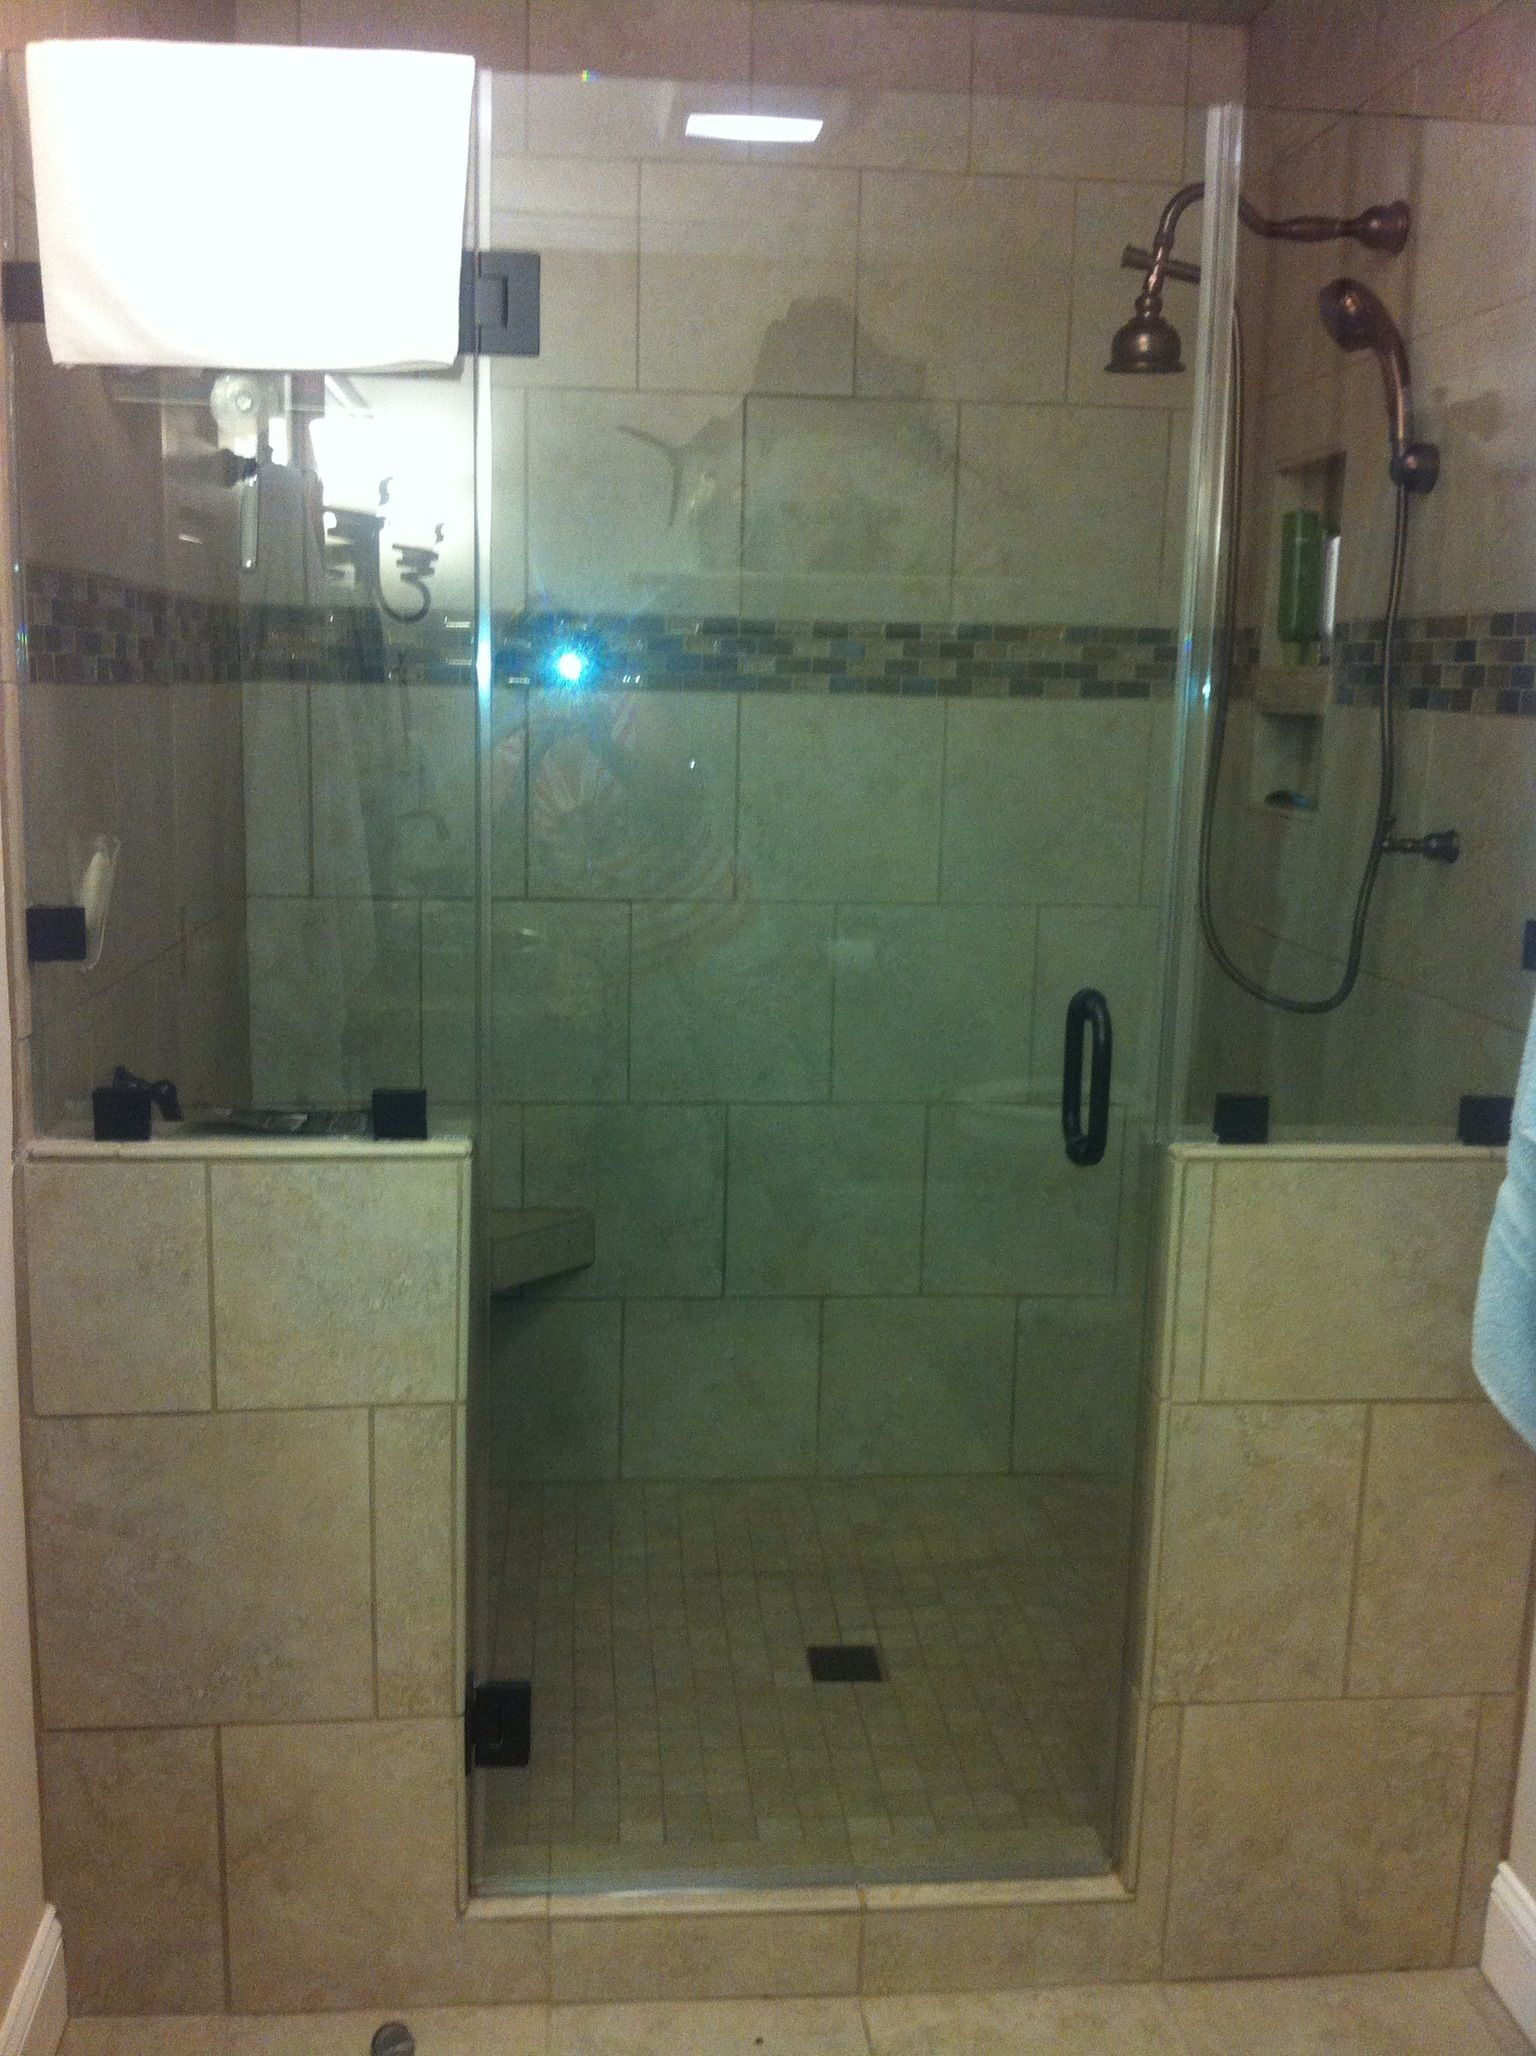 X Tiled Shower Definitely Adding In A Second Shower Head - 4 x 6 tile shower